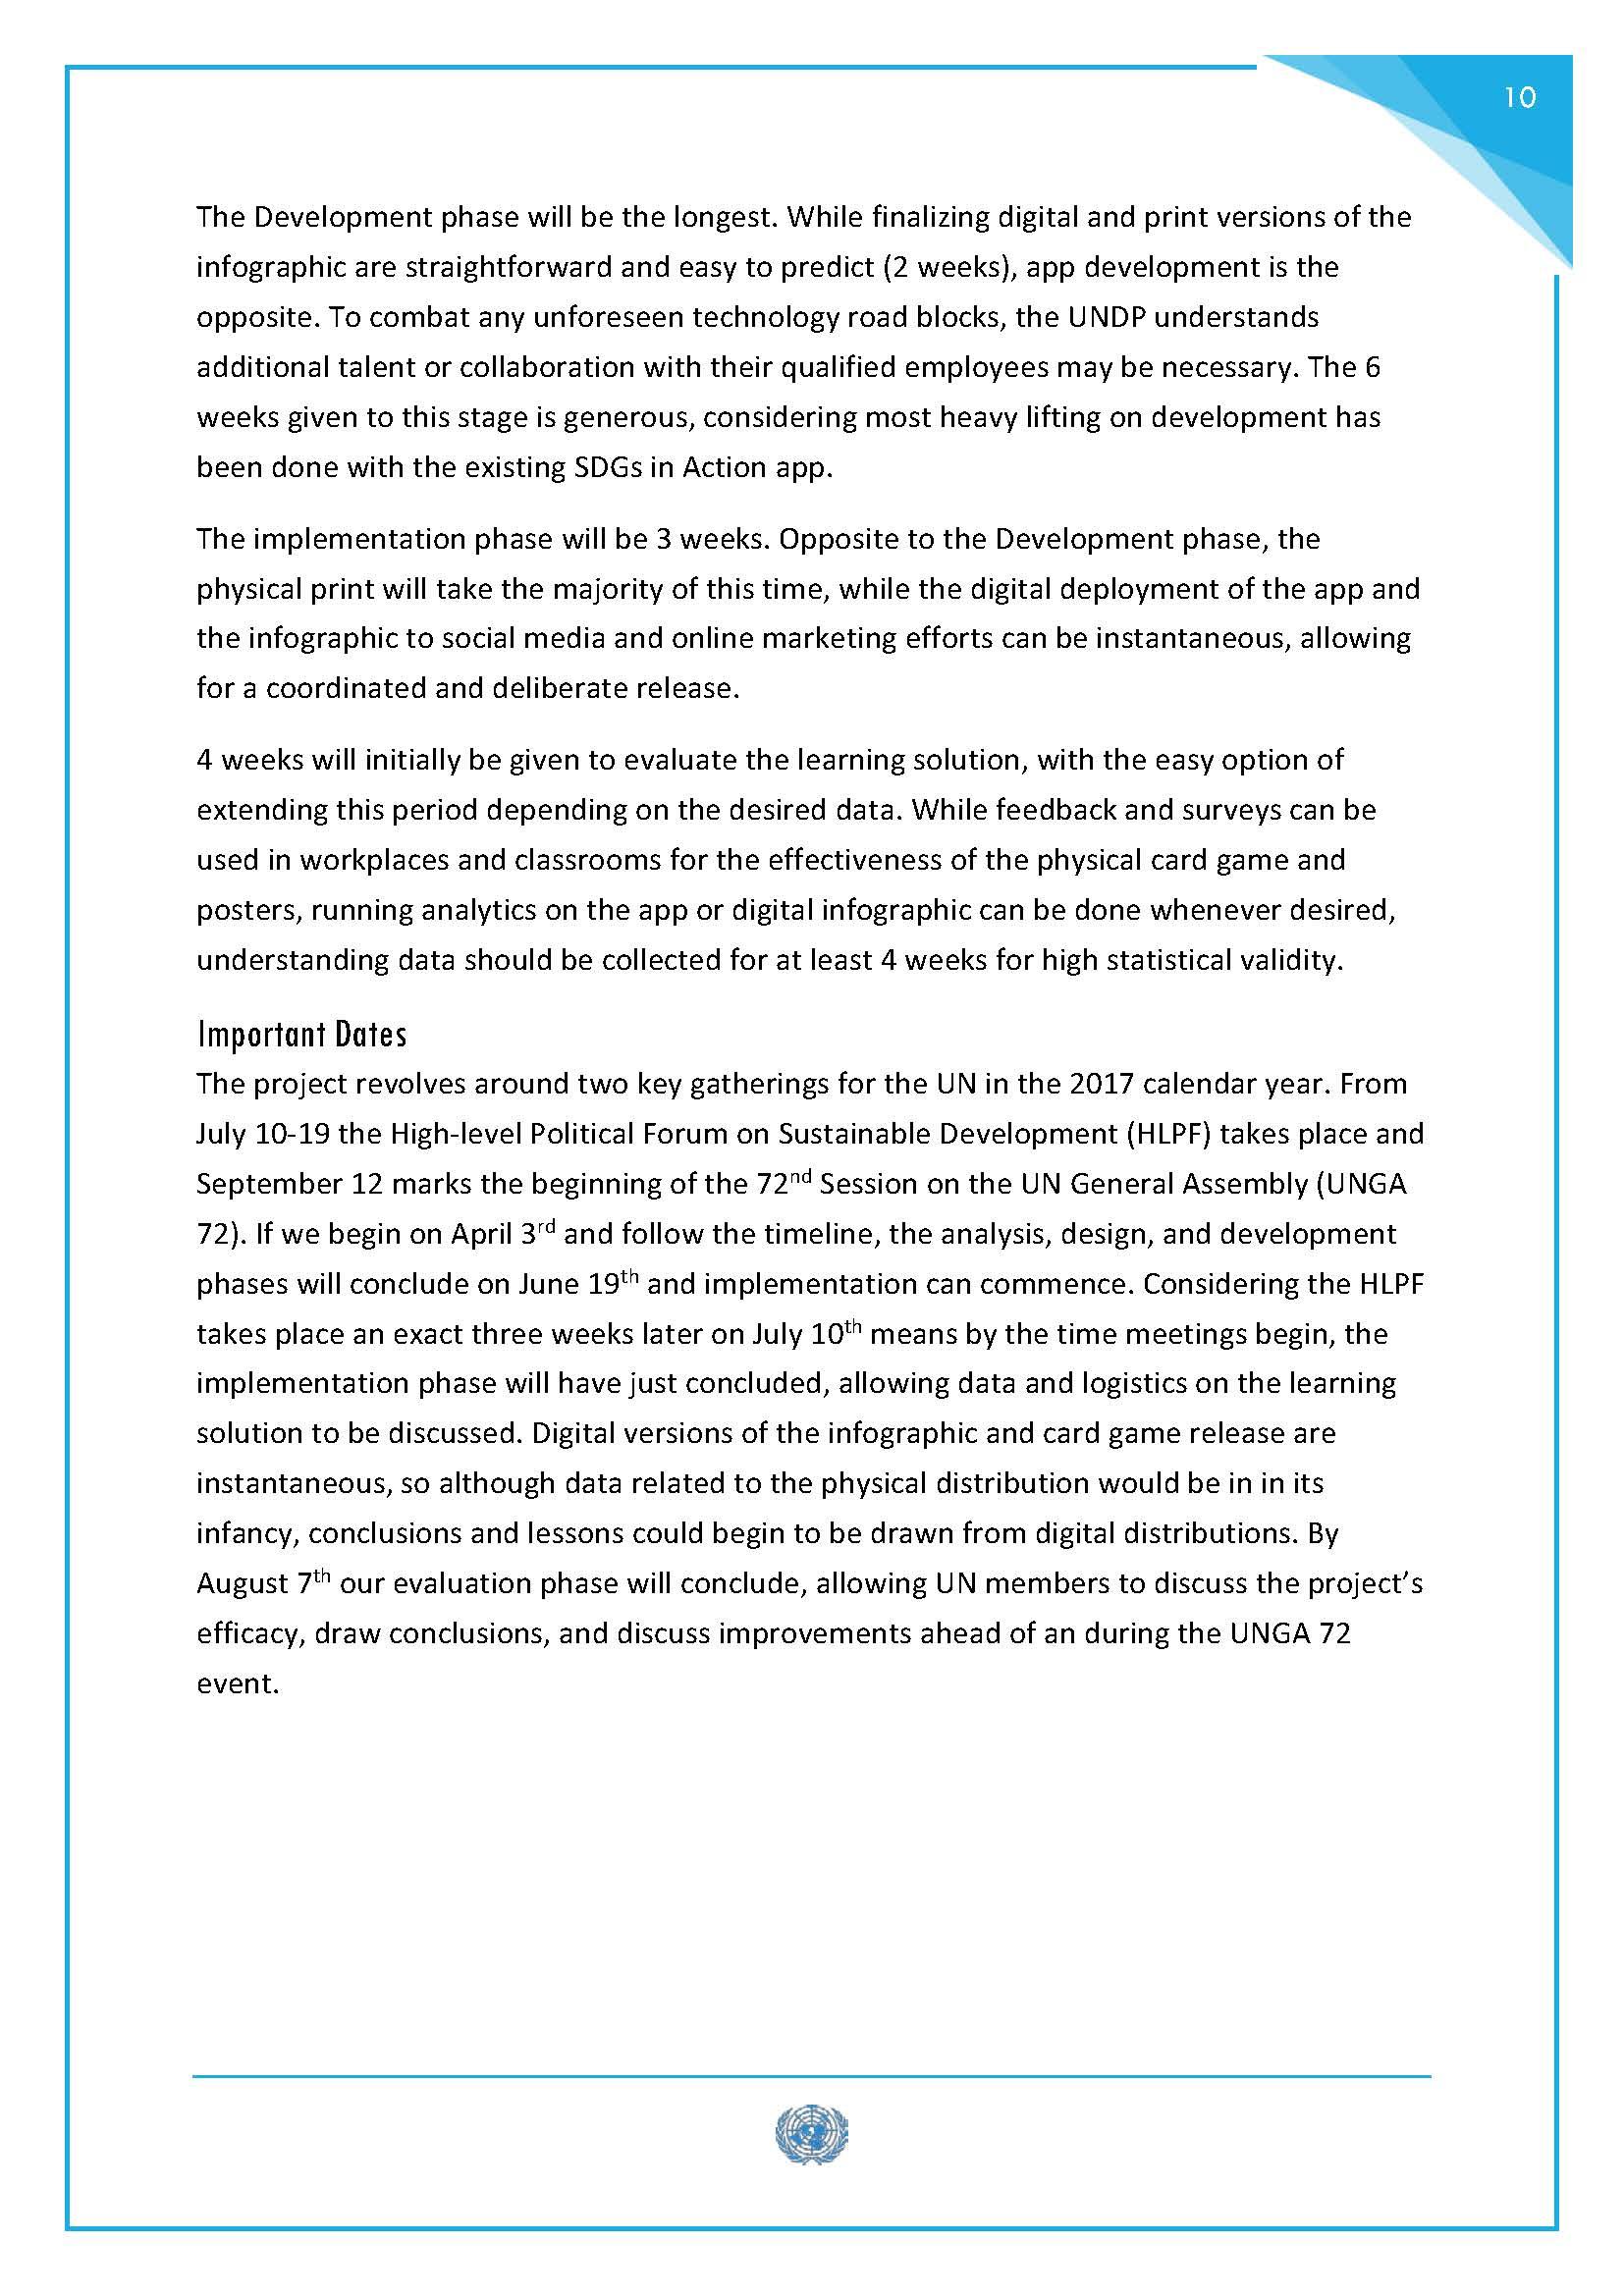 Design Document_Kraus&Beatty_Page_11.jpg